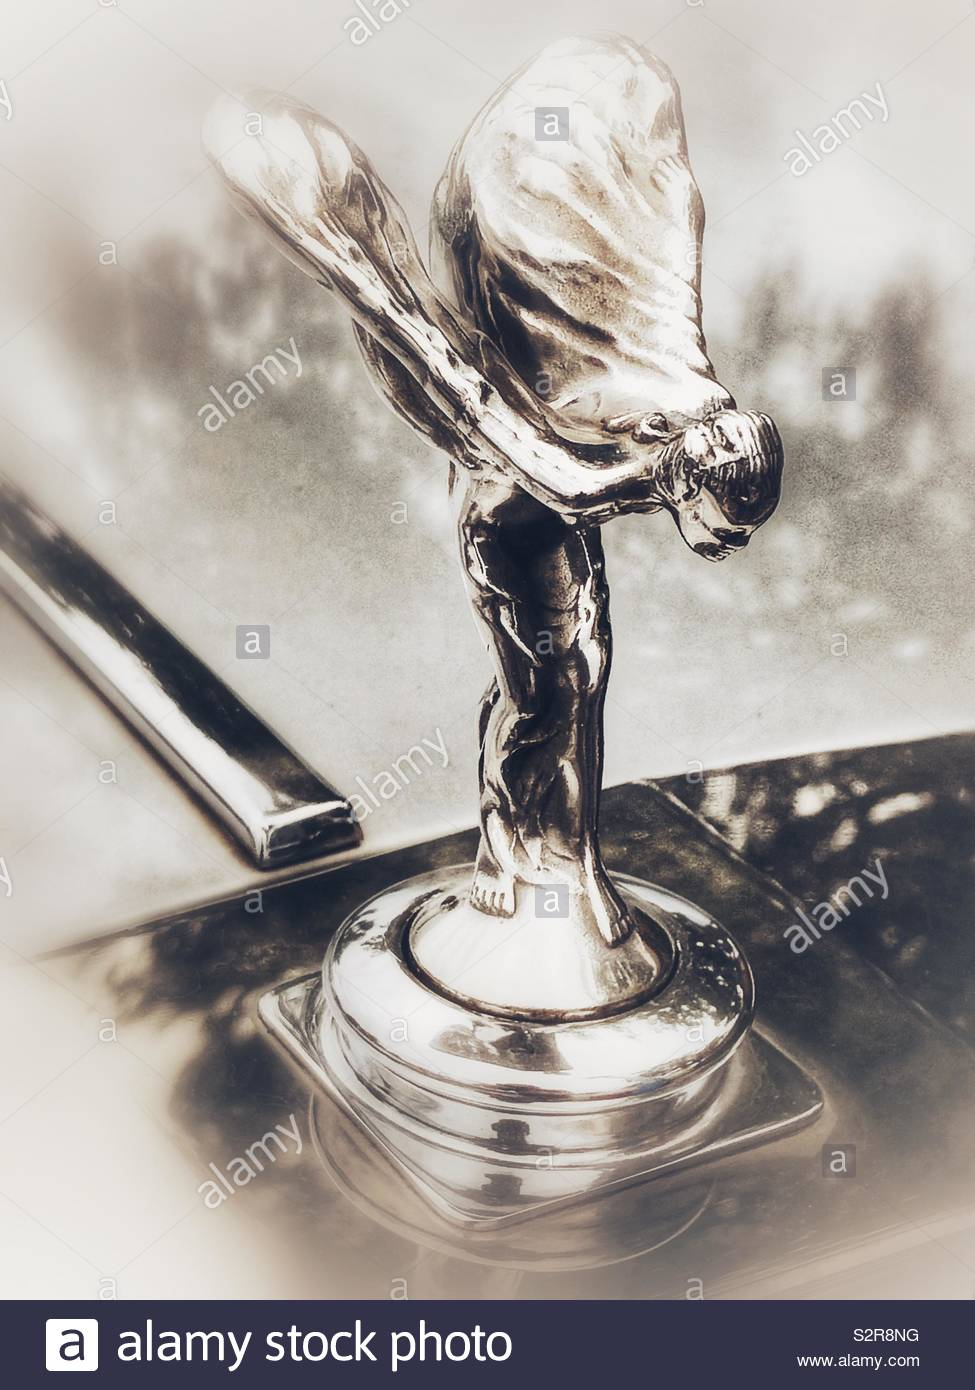 Classica ROLLS-ROYCE-FINE ART PRINT-Silver Shadow Cloud Wraith Spirito immagini